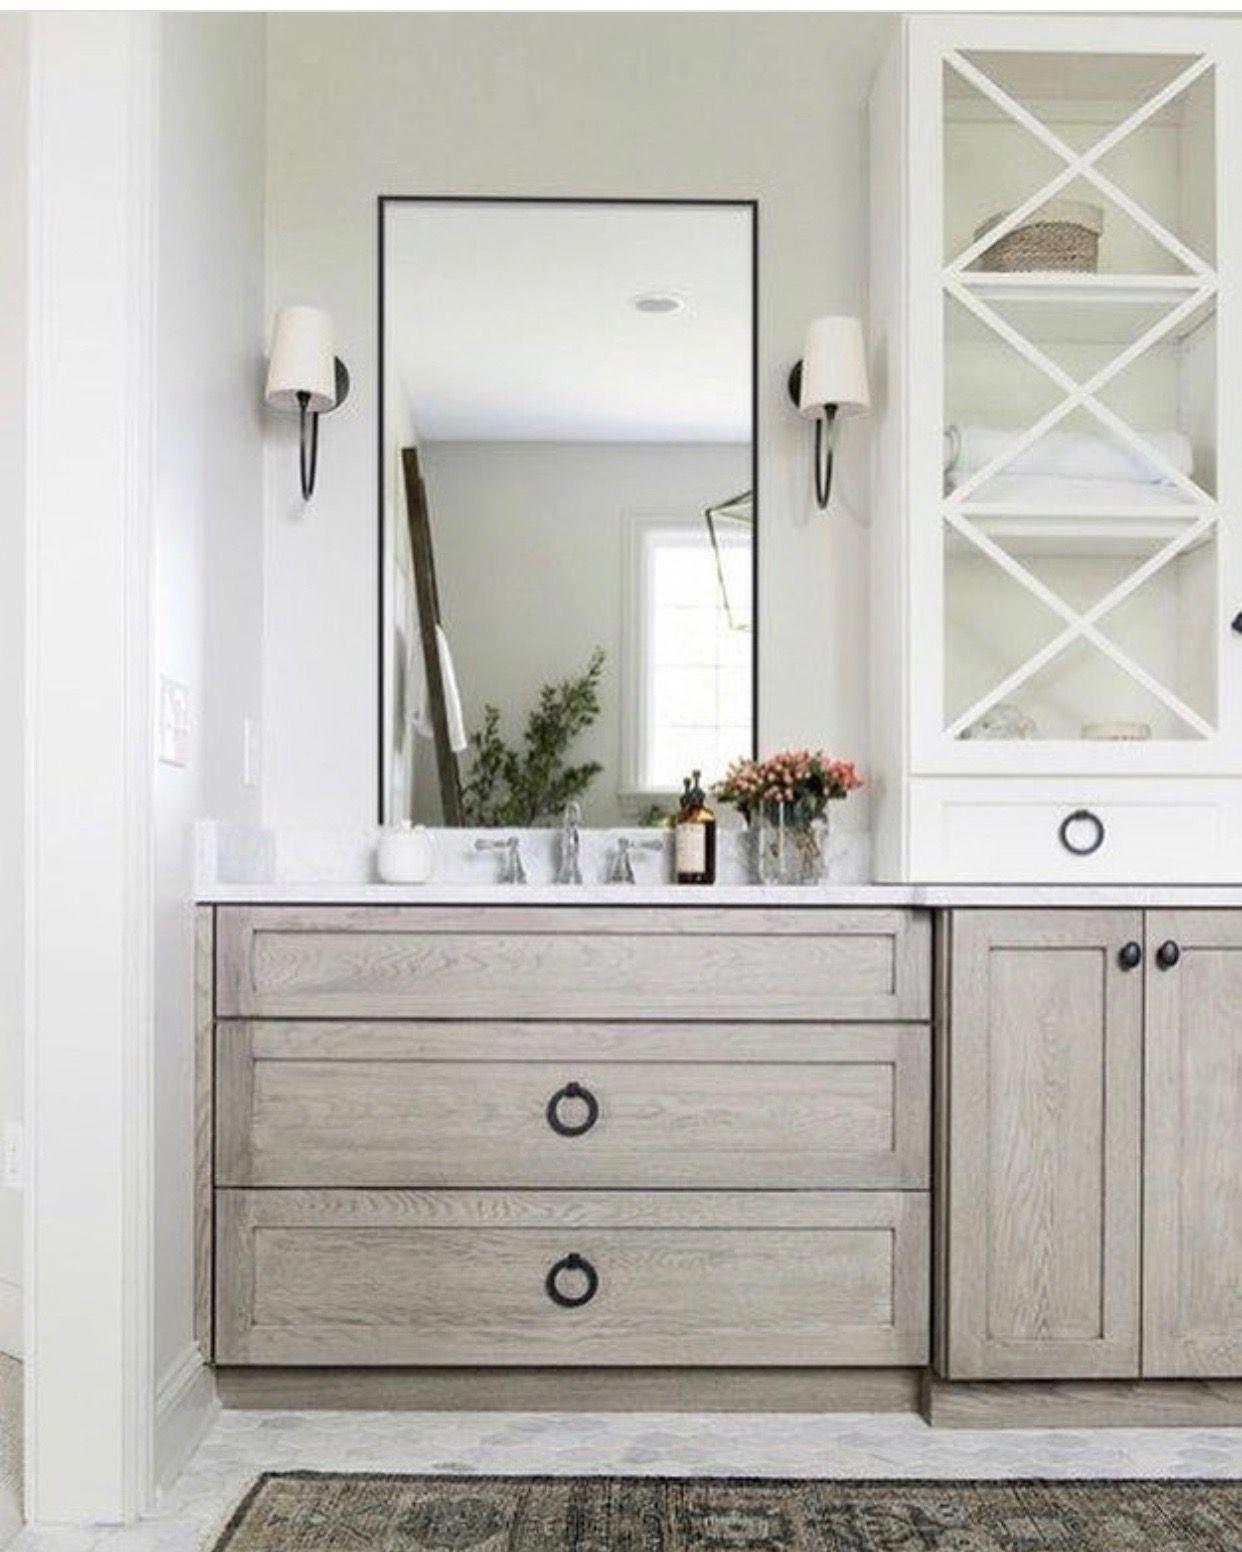 25 Bathroom Cabinet Ideas To Tidy Up Your Bathroom Bathrooms